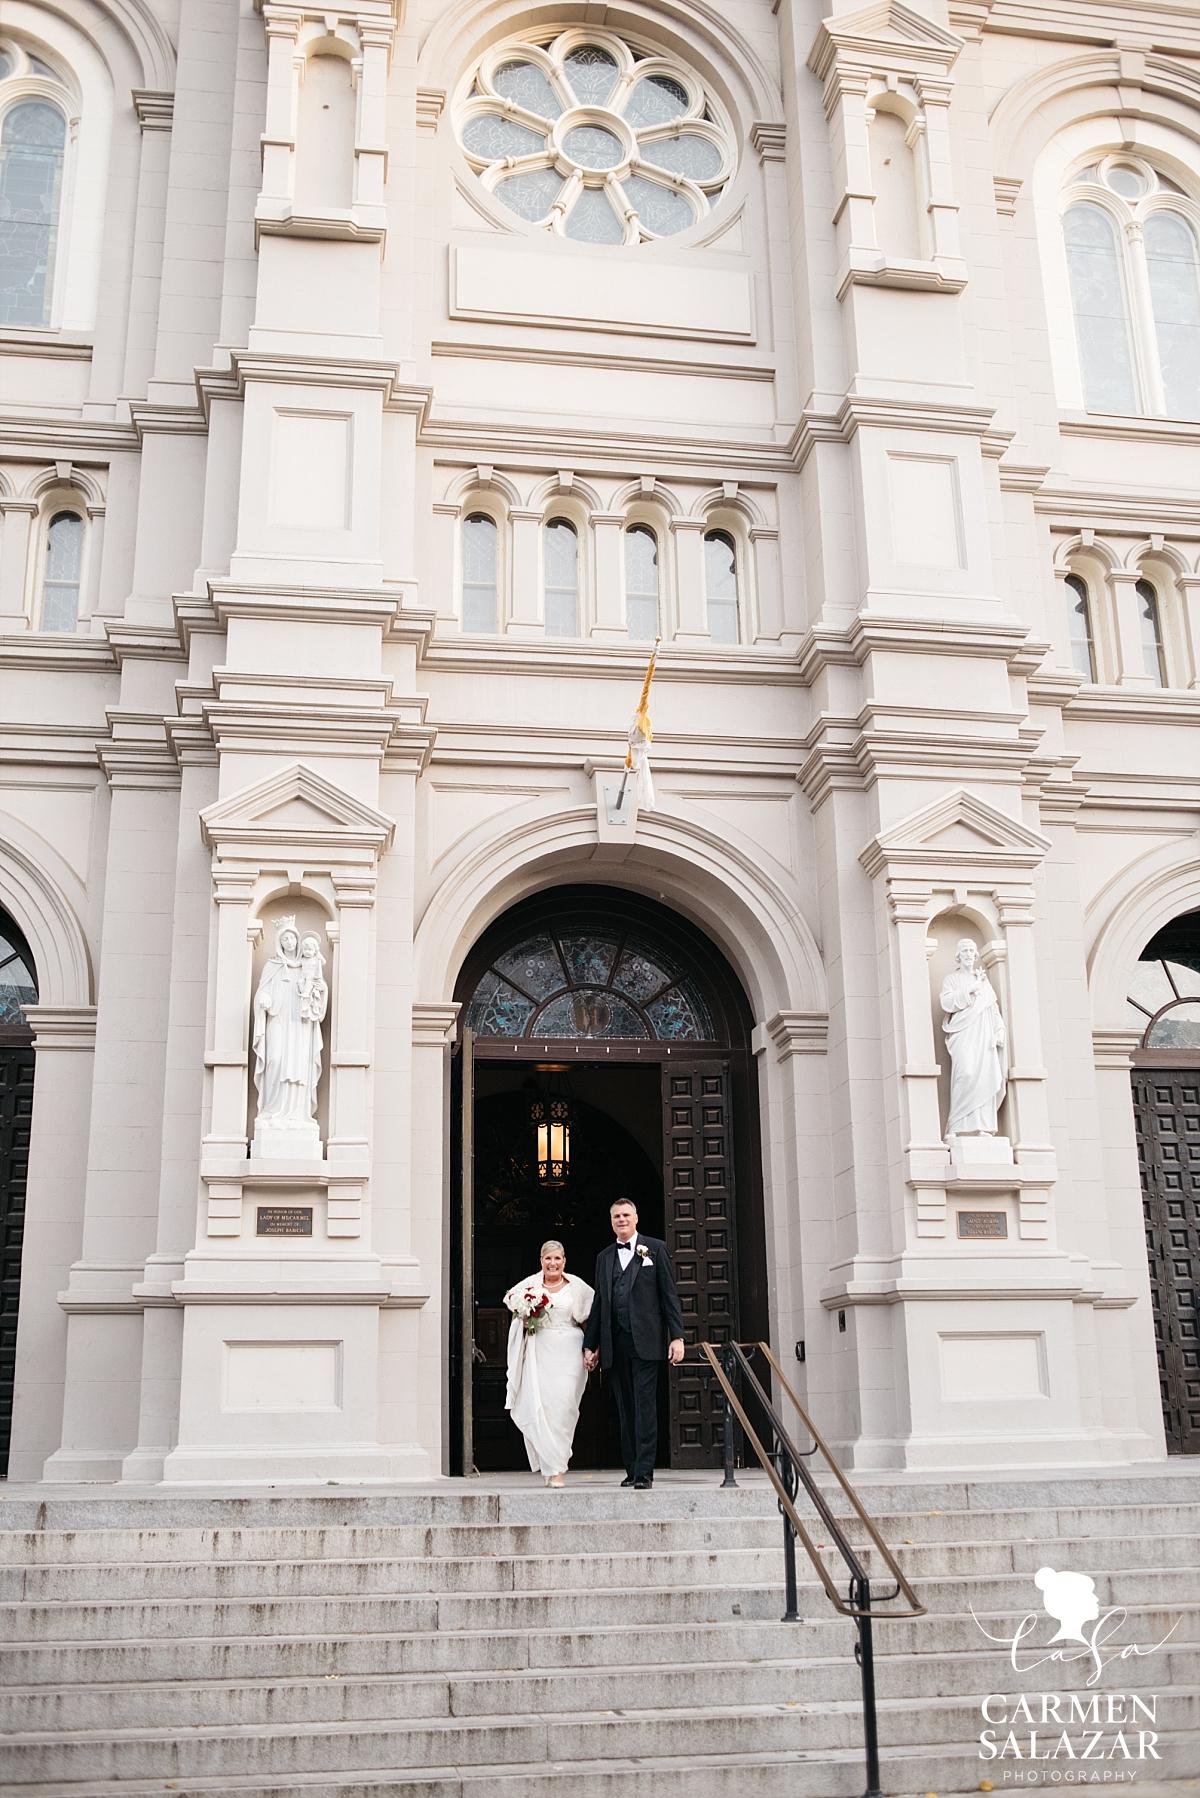 Newlyweds exiting Sacramento cathedral - Carmen Salazar